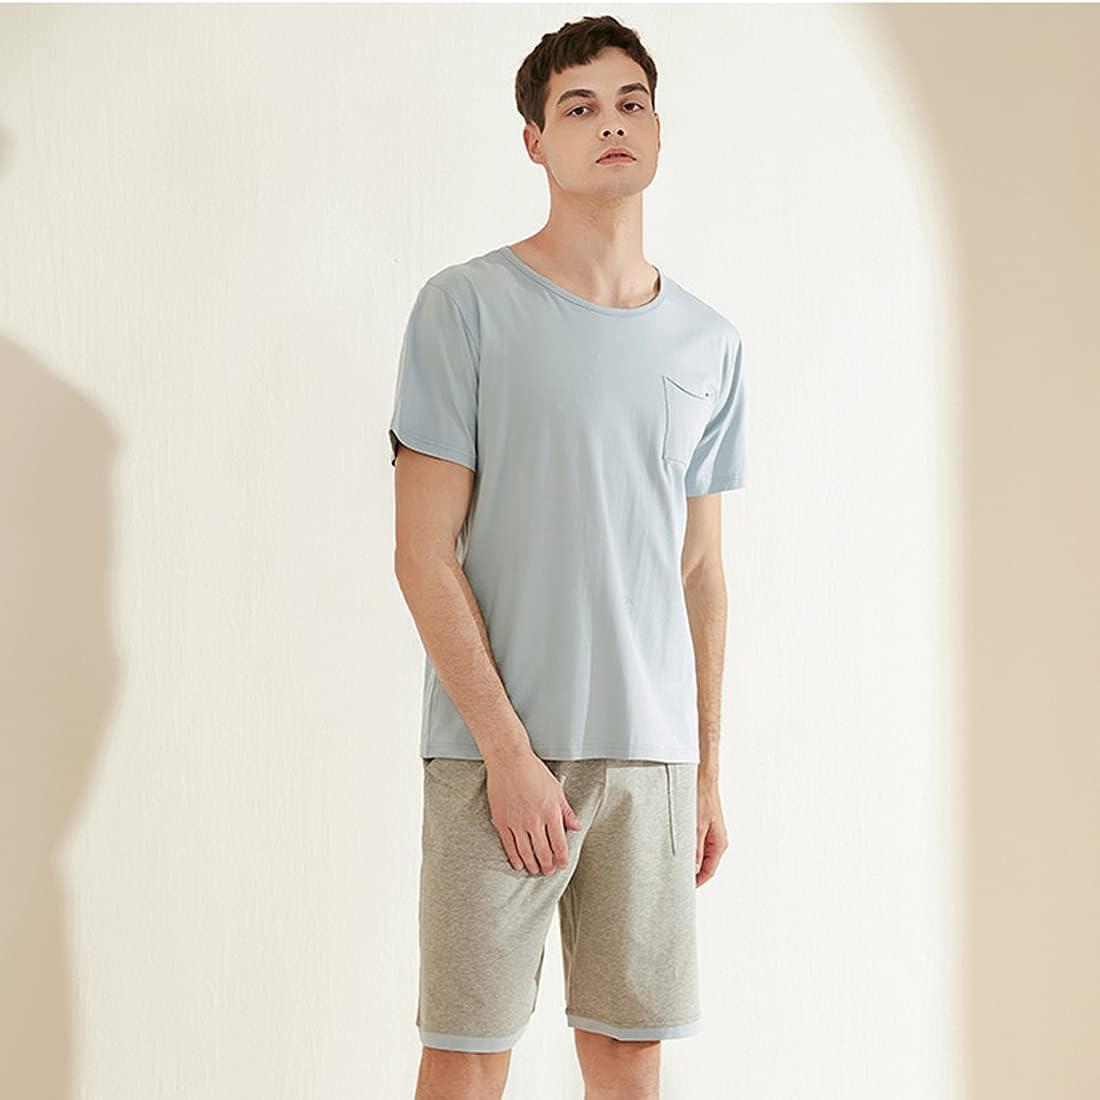 Summer Mens Round neck Pajama Set Short Sleeve Shirt Shorts with Pocekts Sets Sleepwear Pjs Set Lightweight L-3XL